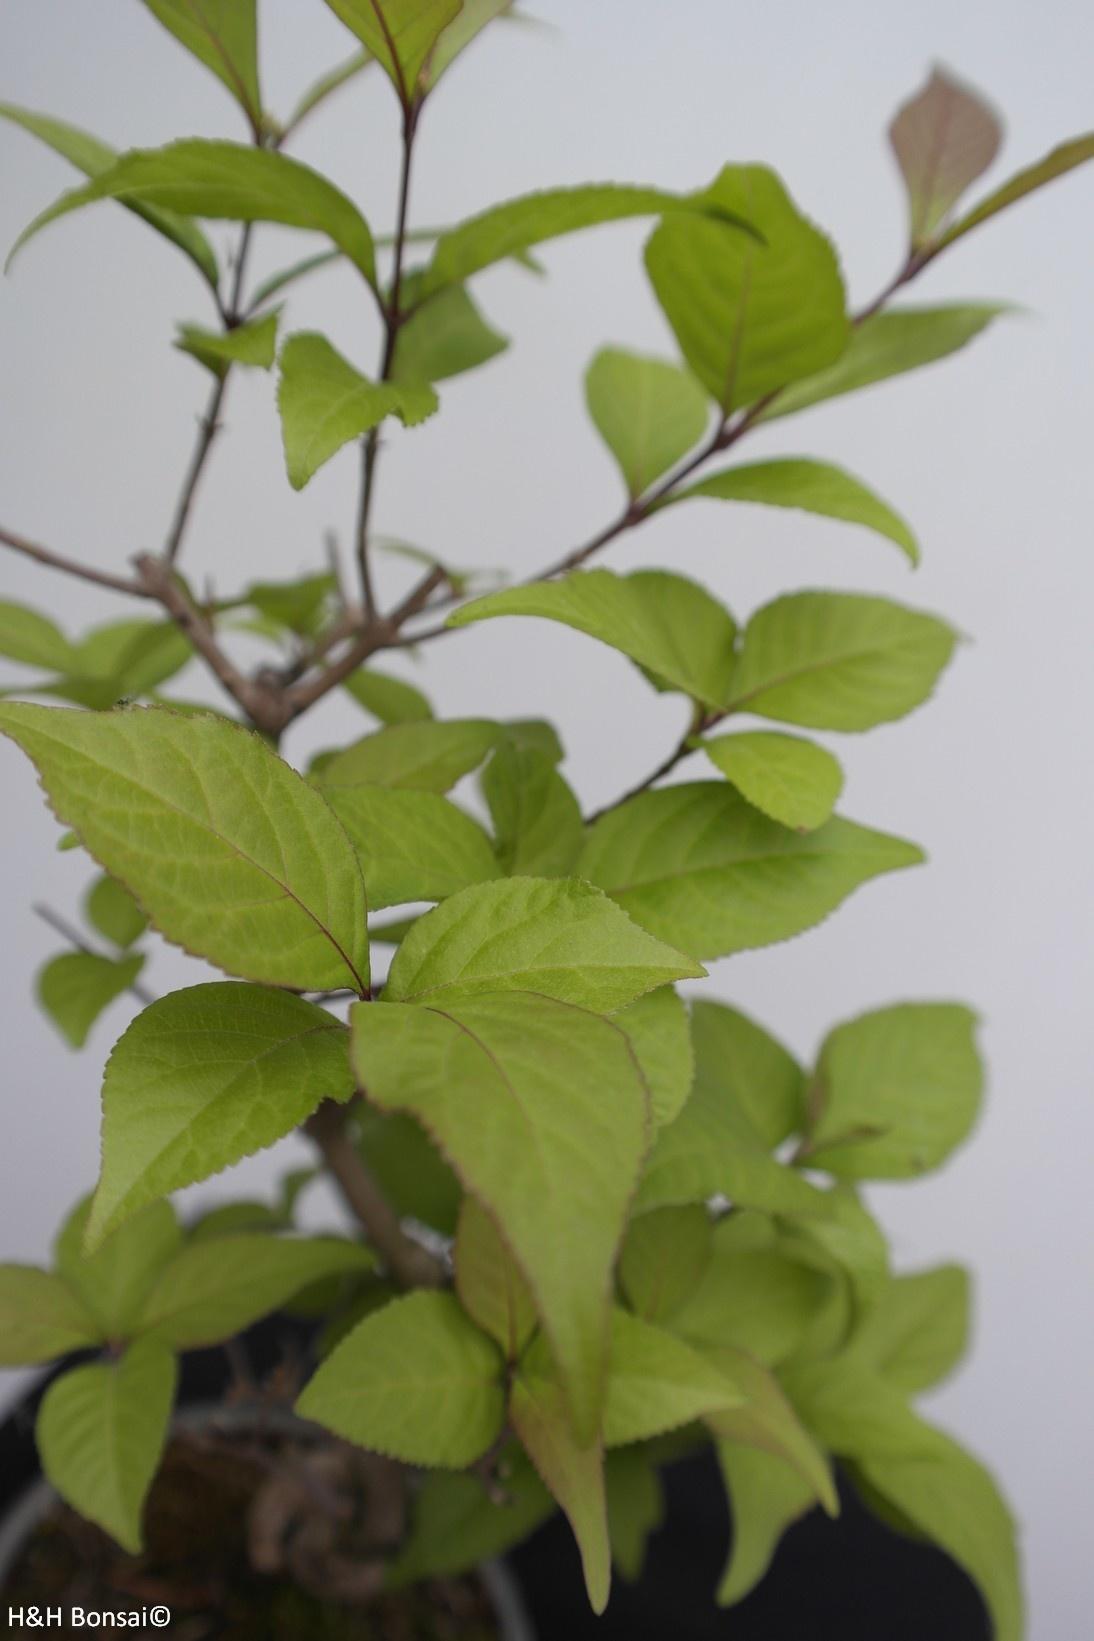 Bonsai Japanese Beautyberry, Callicarpa japonica, no. 7768